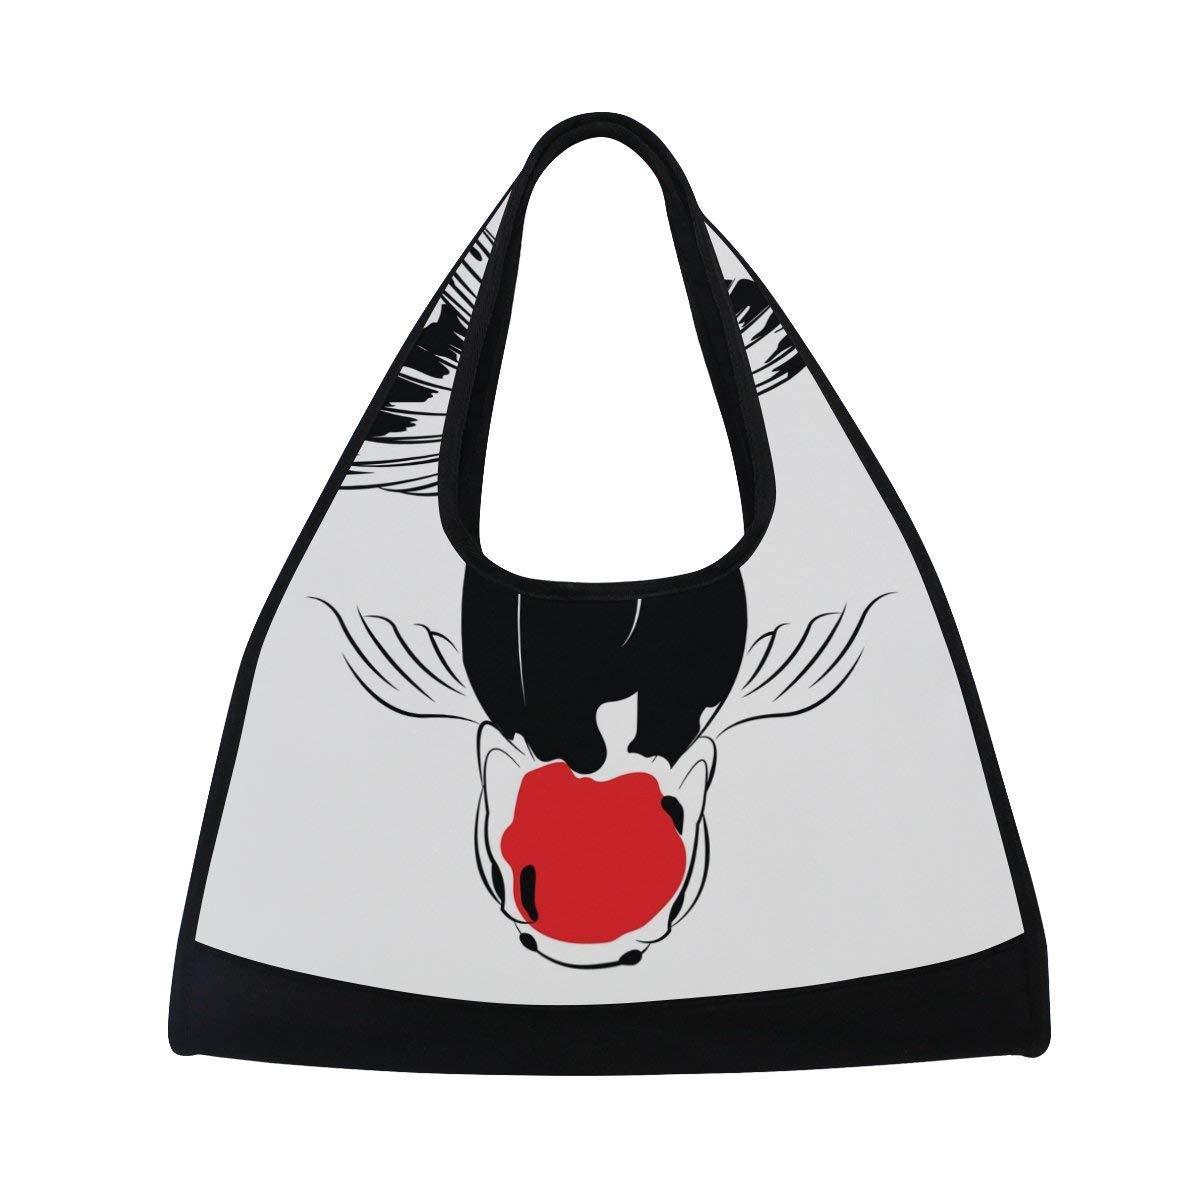 OuLian Sport Gym Bag Koi Fish Canvas Travel Duffel Bag